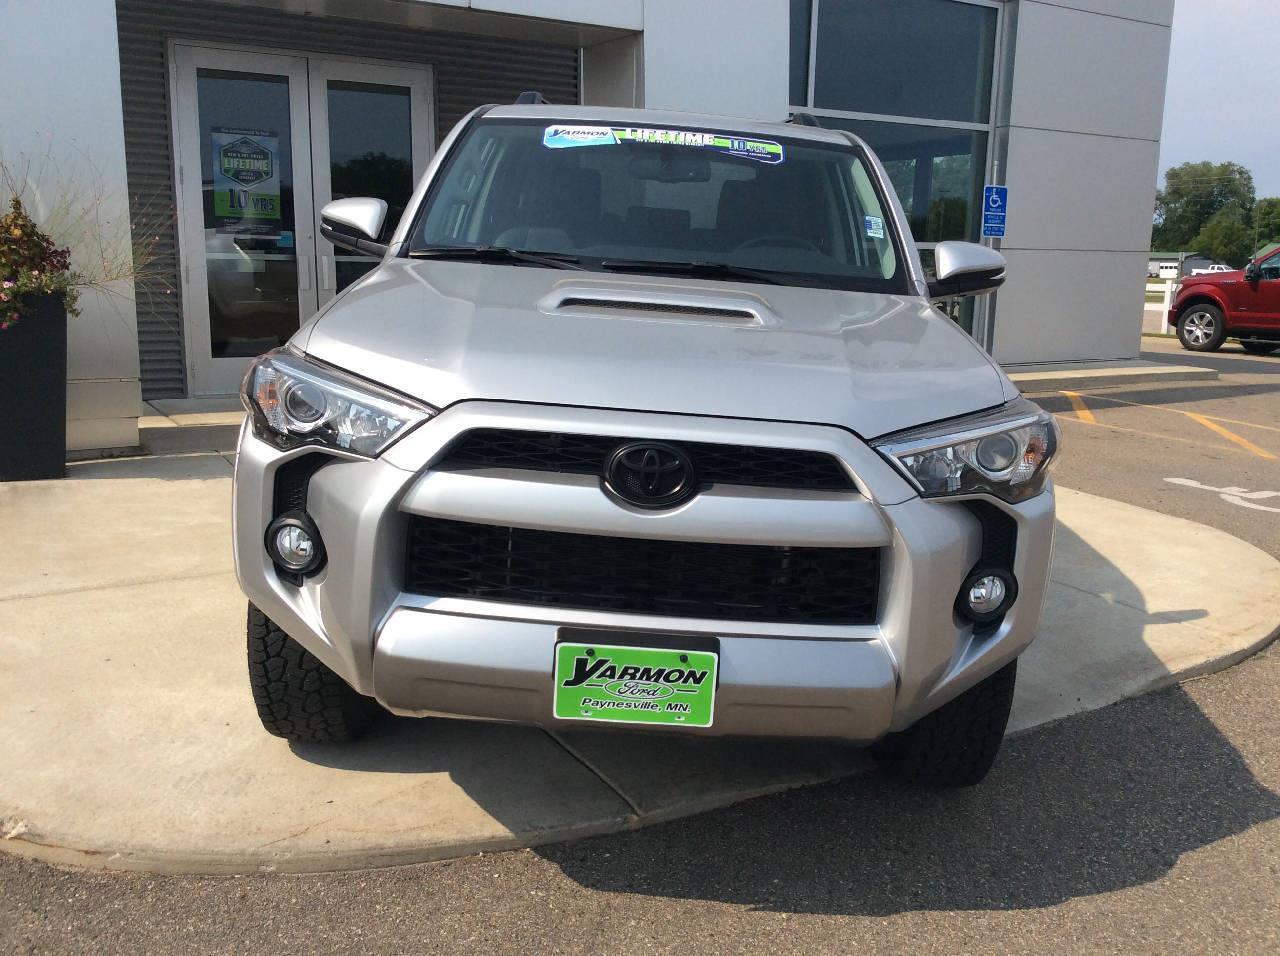 Used 2019 Toyota 4Runner Off-Road Premium with VIN JTEBU5JR4K5636915 for sale in Paynesville, Minnesota